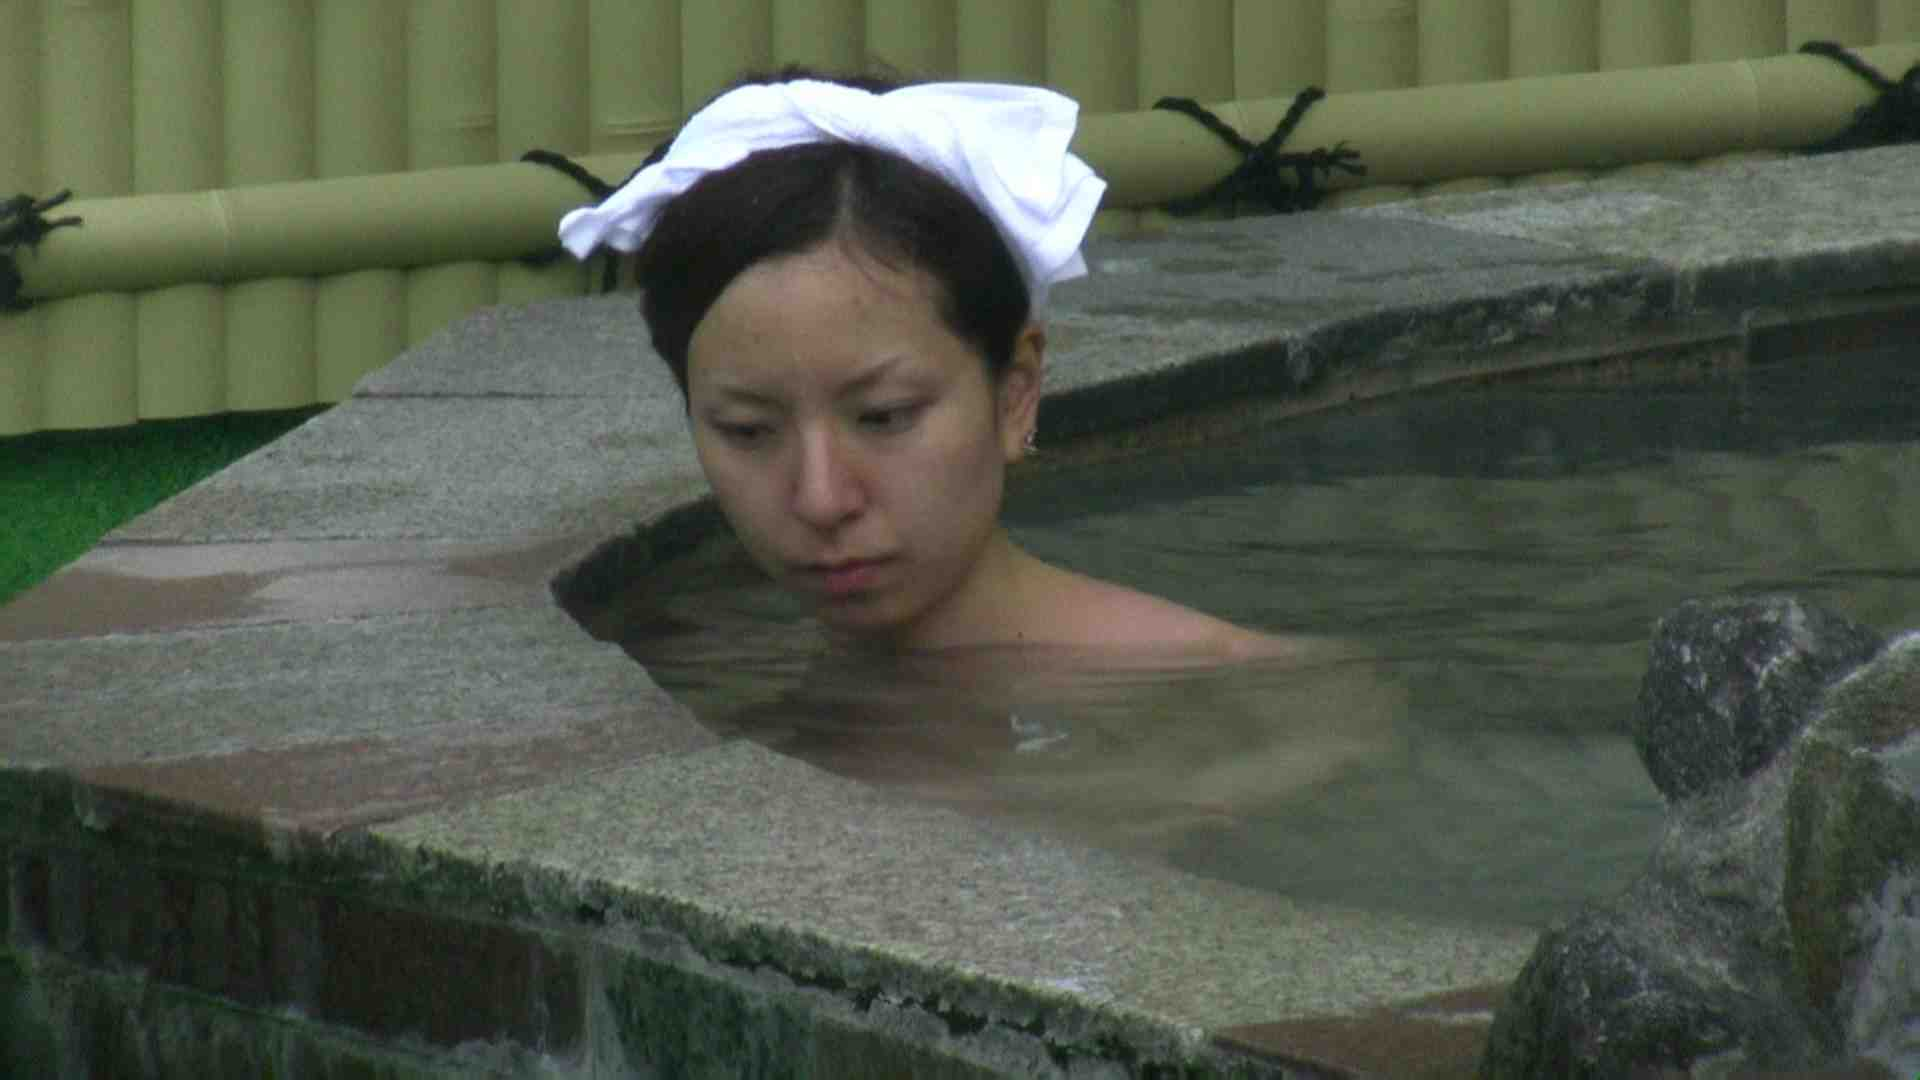 Aquaな露天風呂Vol.39【VIP】 綺麗なOLたち オマンコ動画キャプチャ 111枚 44